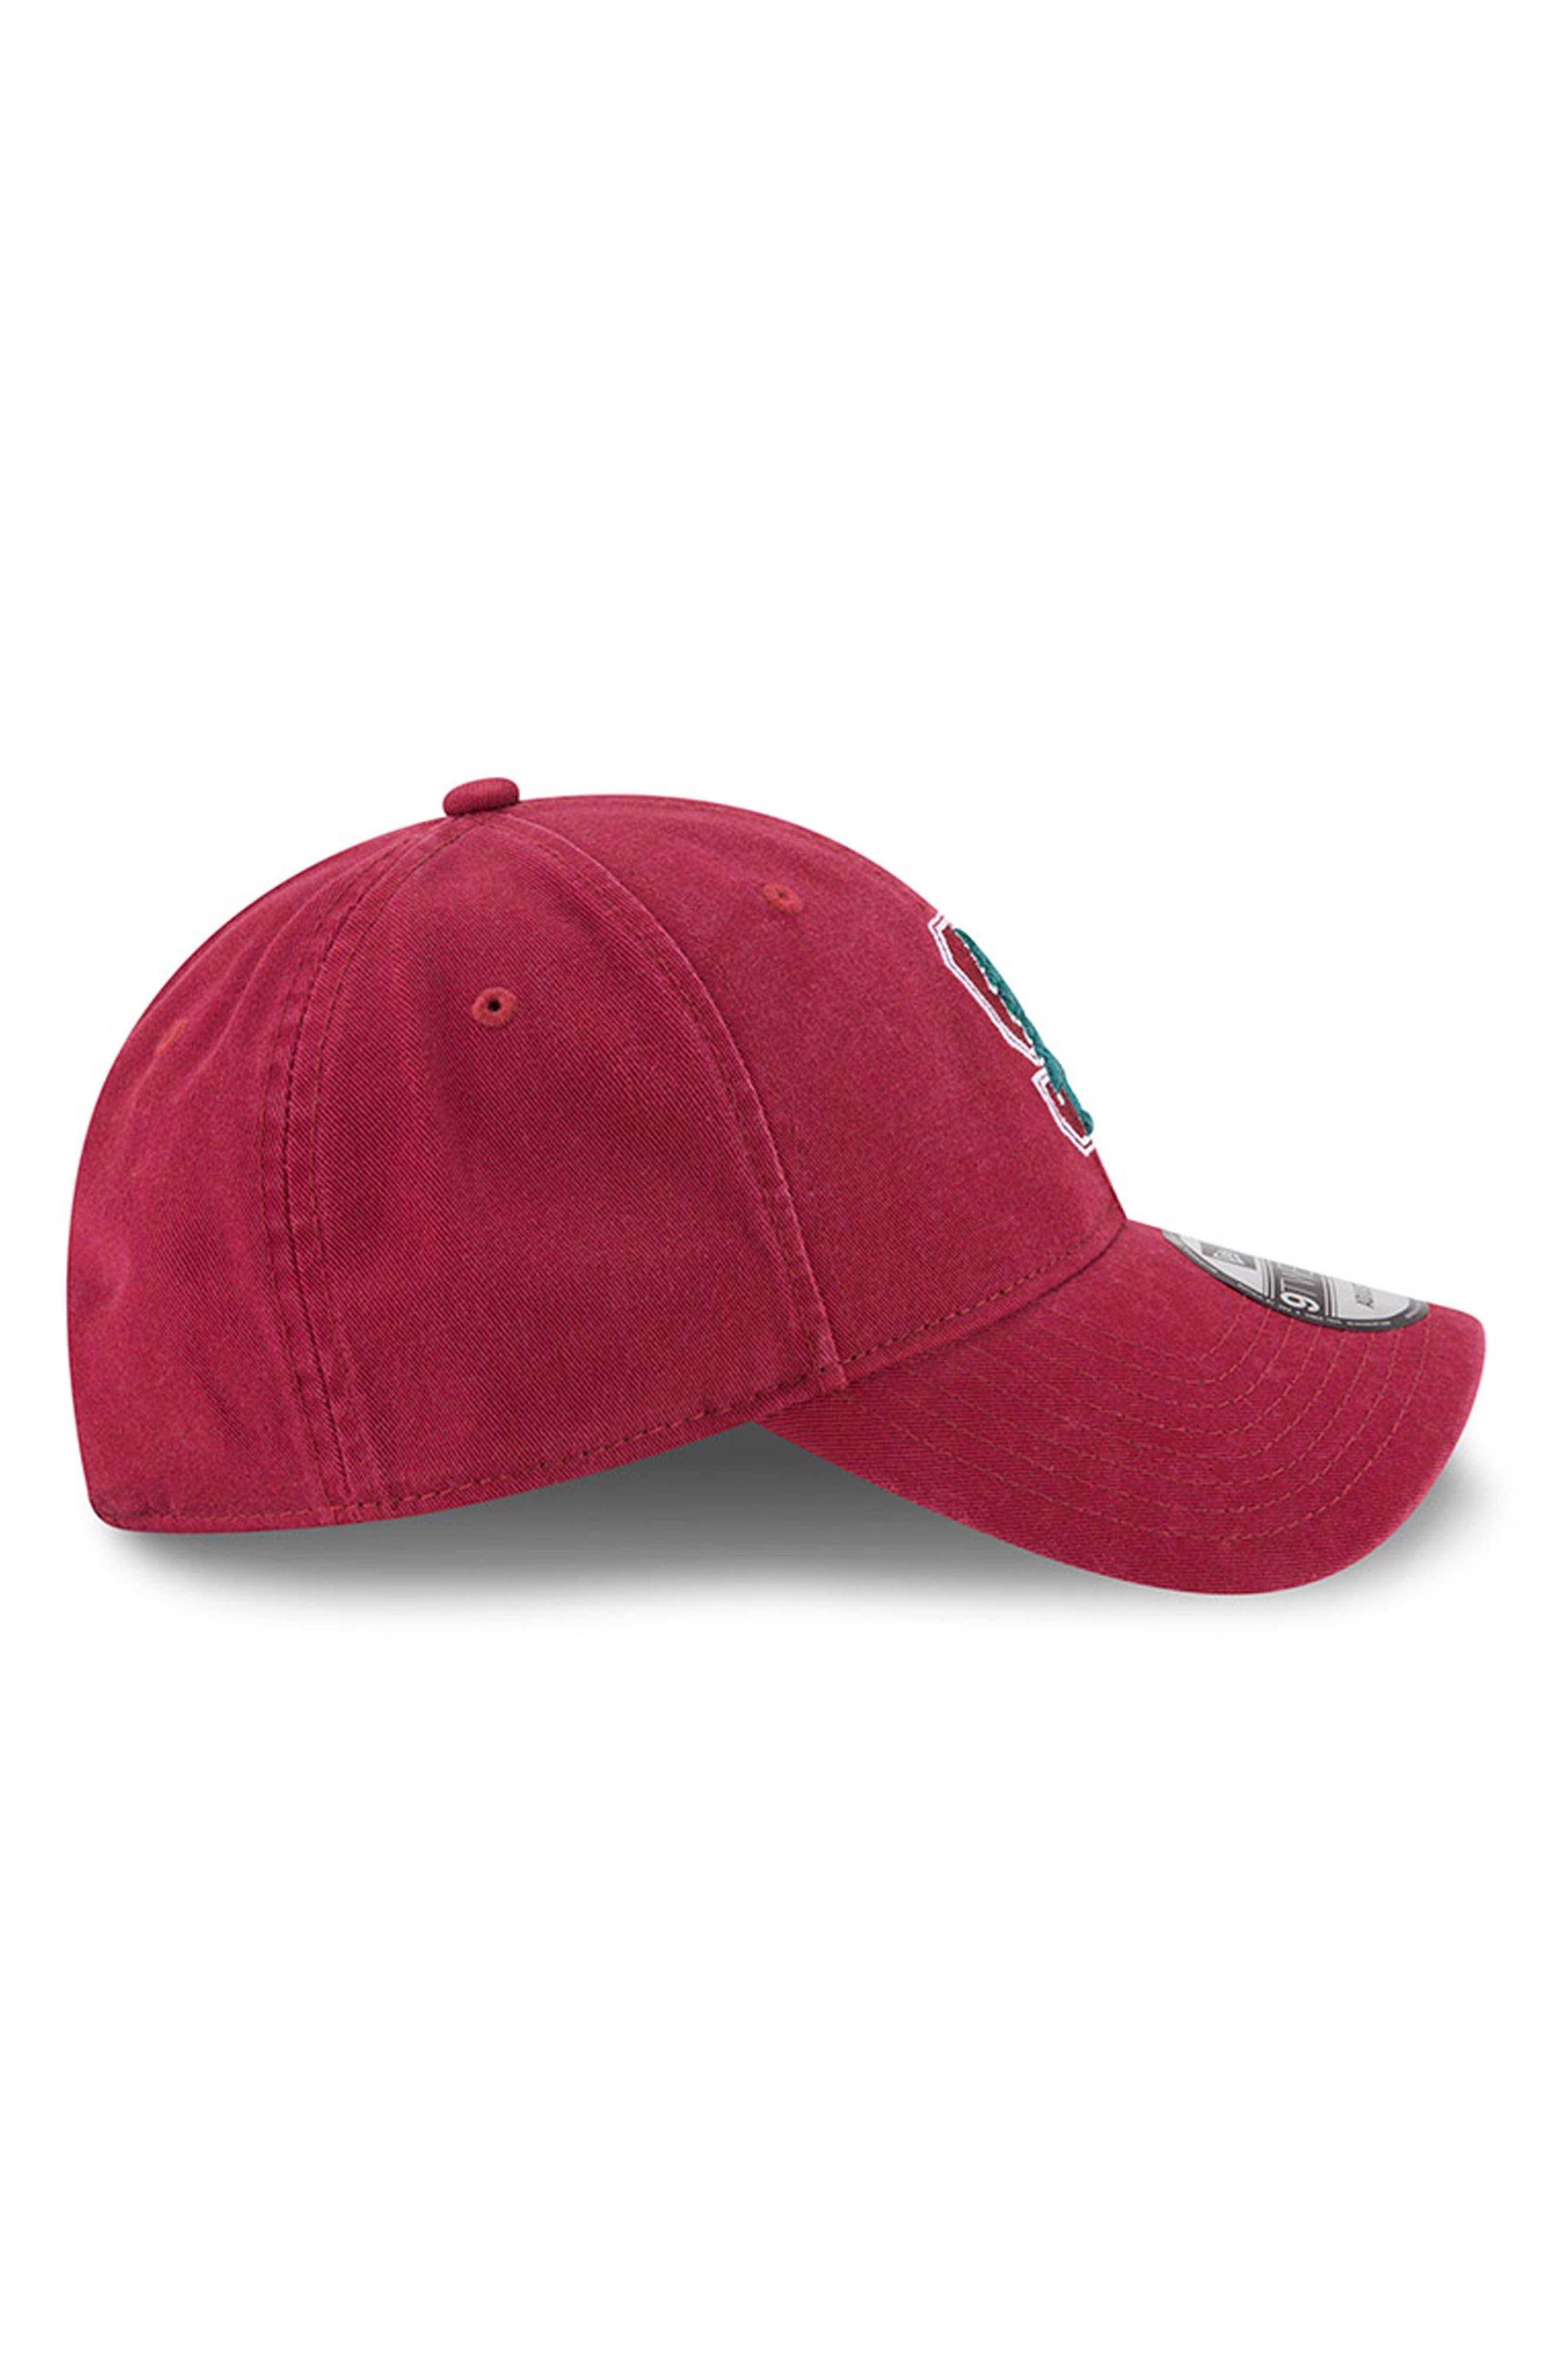 New Era Collegiate Core Classic - Stanford Cardinal Baseball Cap,                             Alternate thumbnail 4, color,                             601